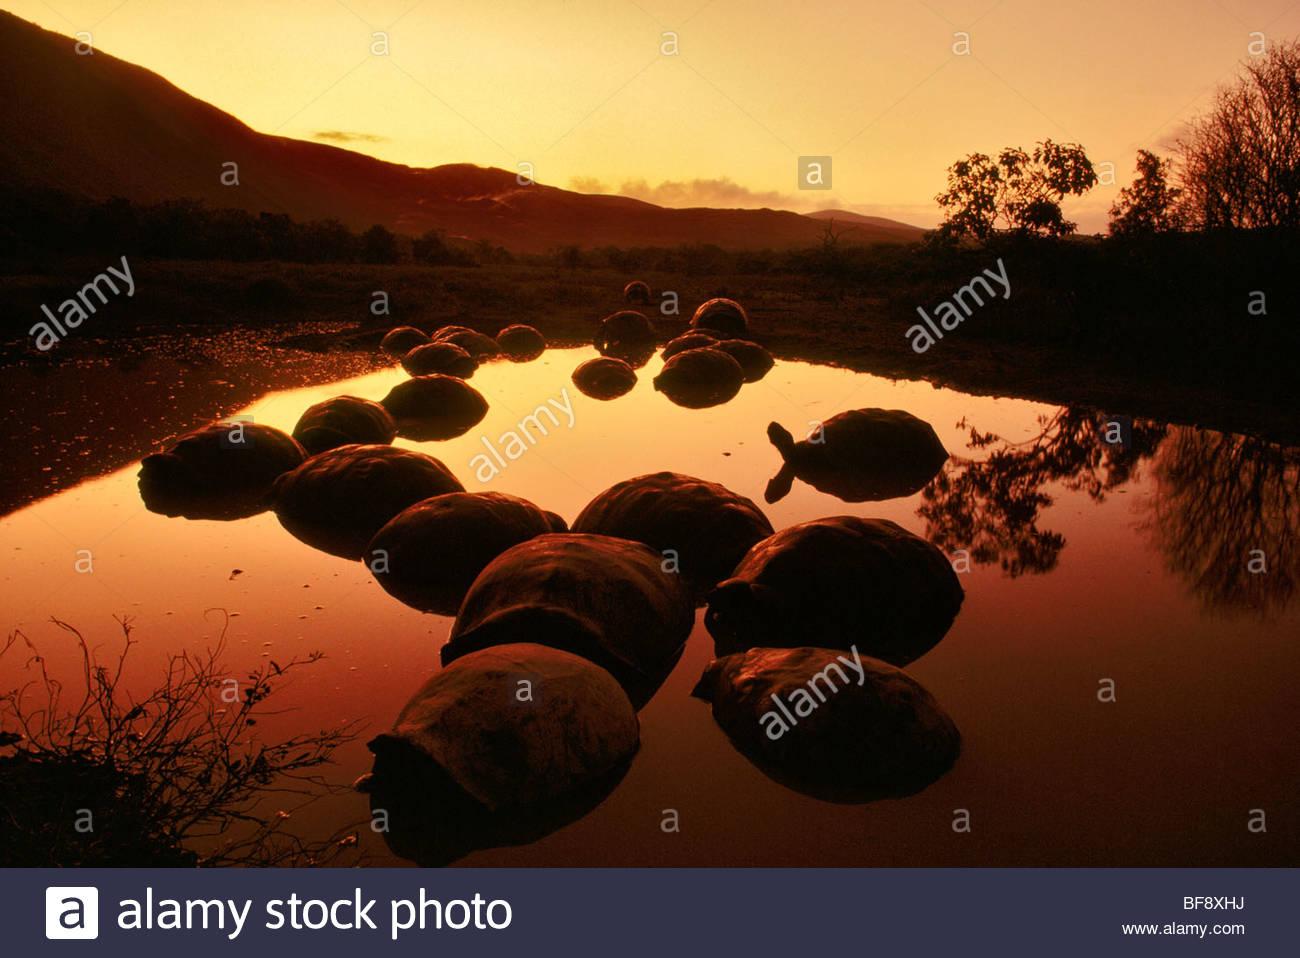 Giant tortoises in pond, Geochelone nigra, Alcedo Volcano, Galapagos Islands - Stock Image